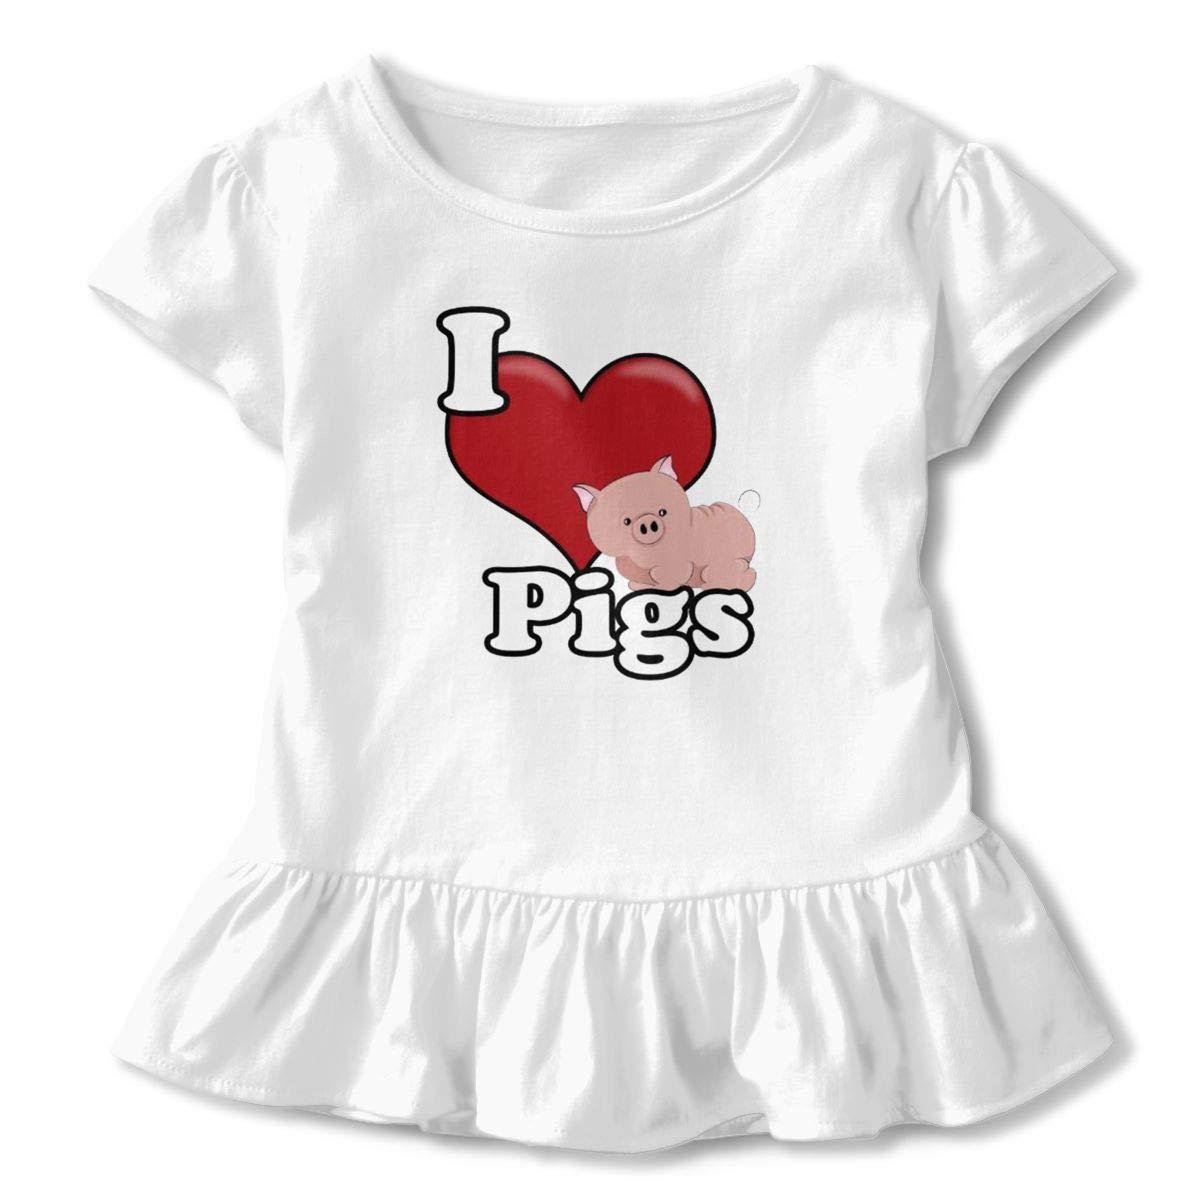 Love Pigs Toddler Baby Girls Short Sleeve Ruffle T-Shirt